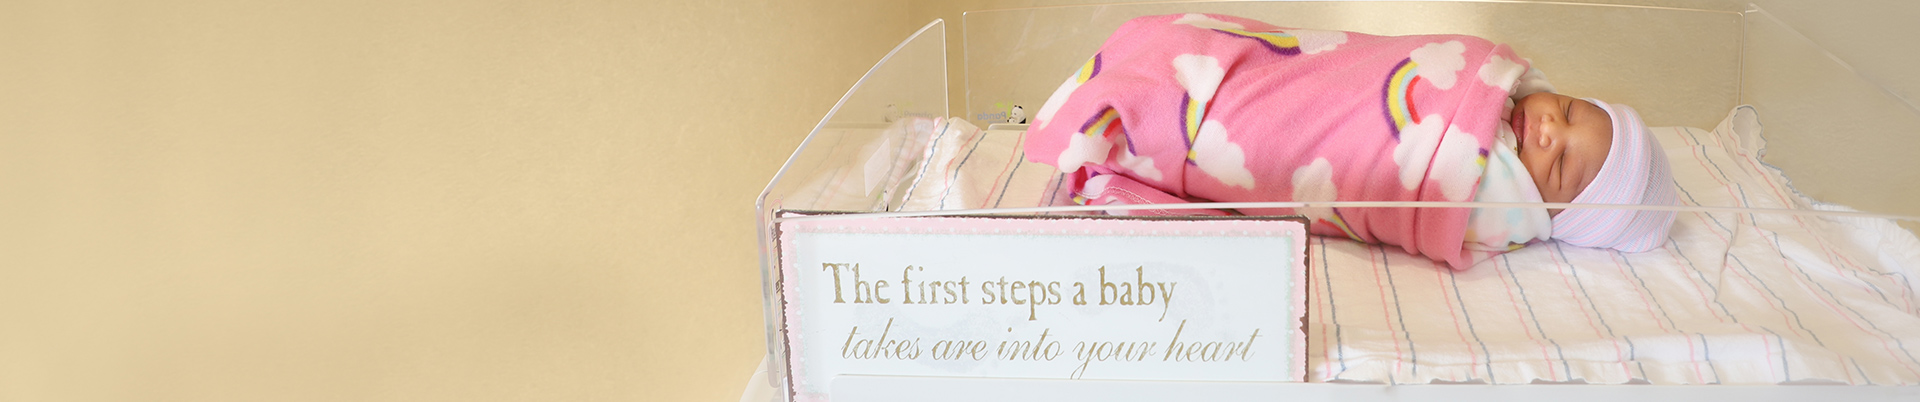 Babycenterbanner.jpg